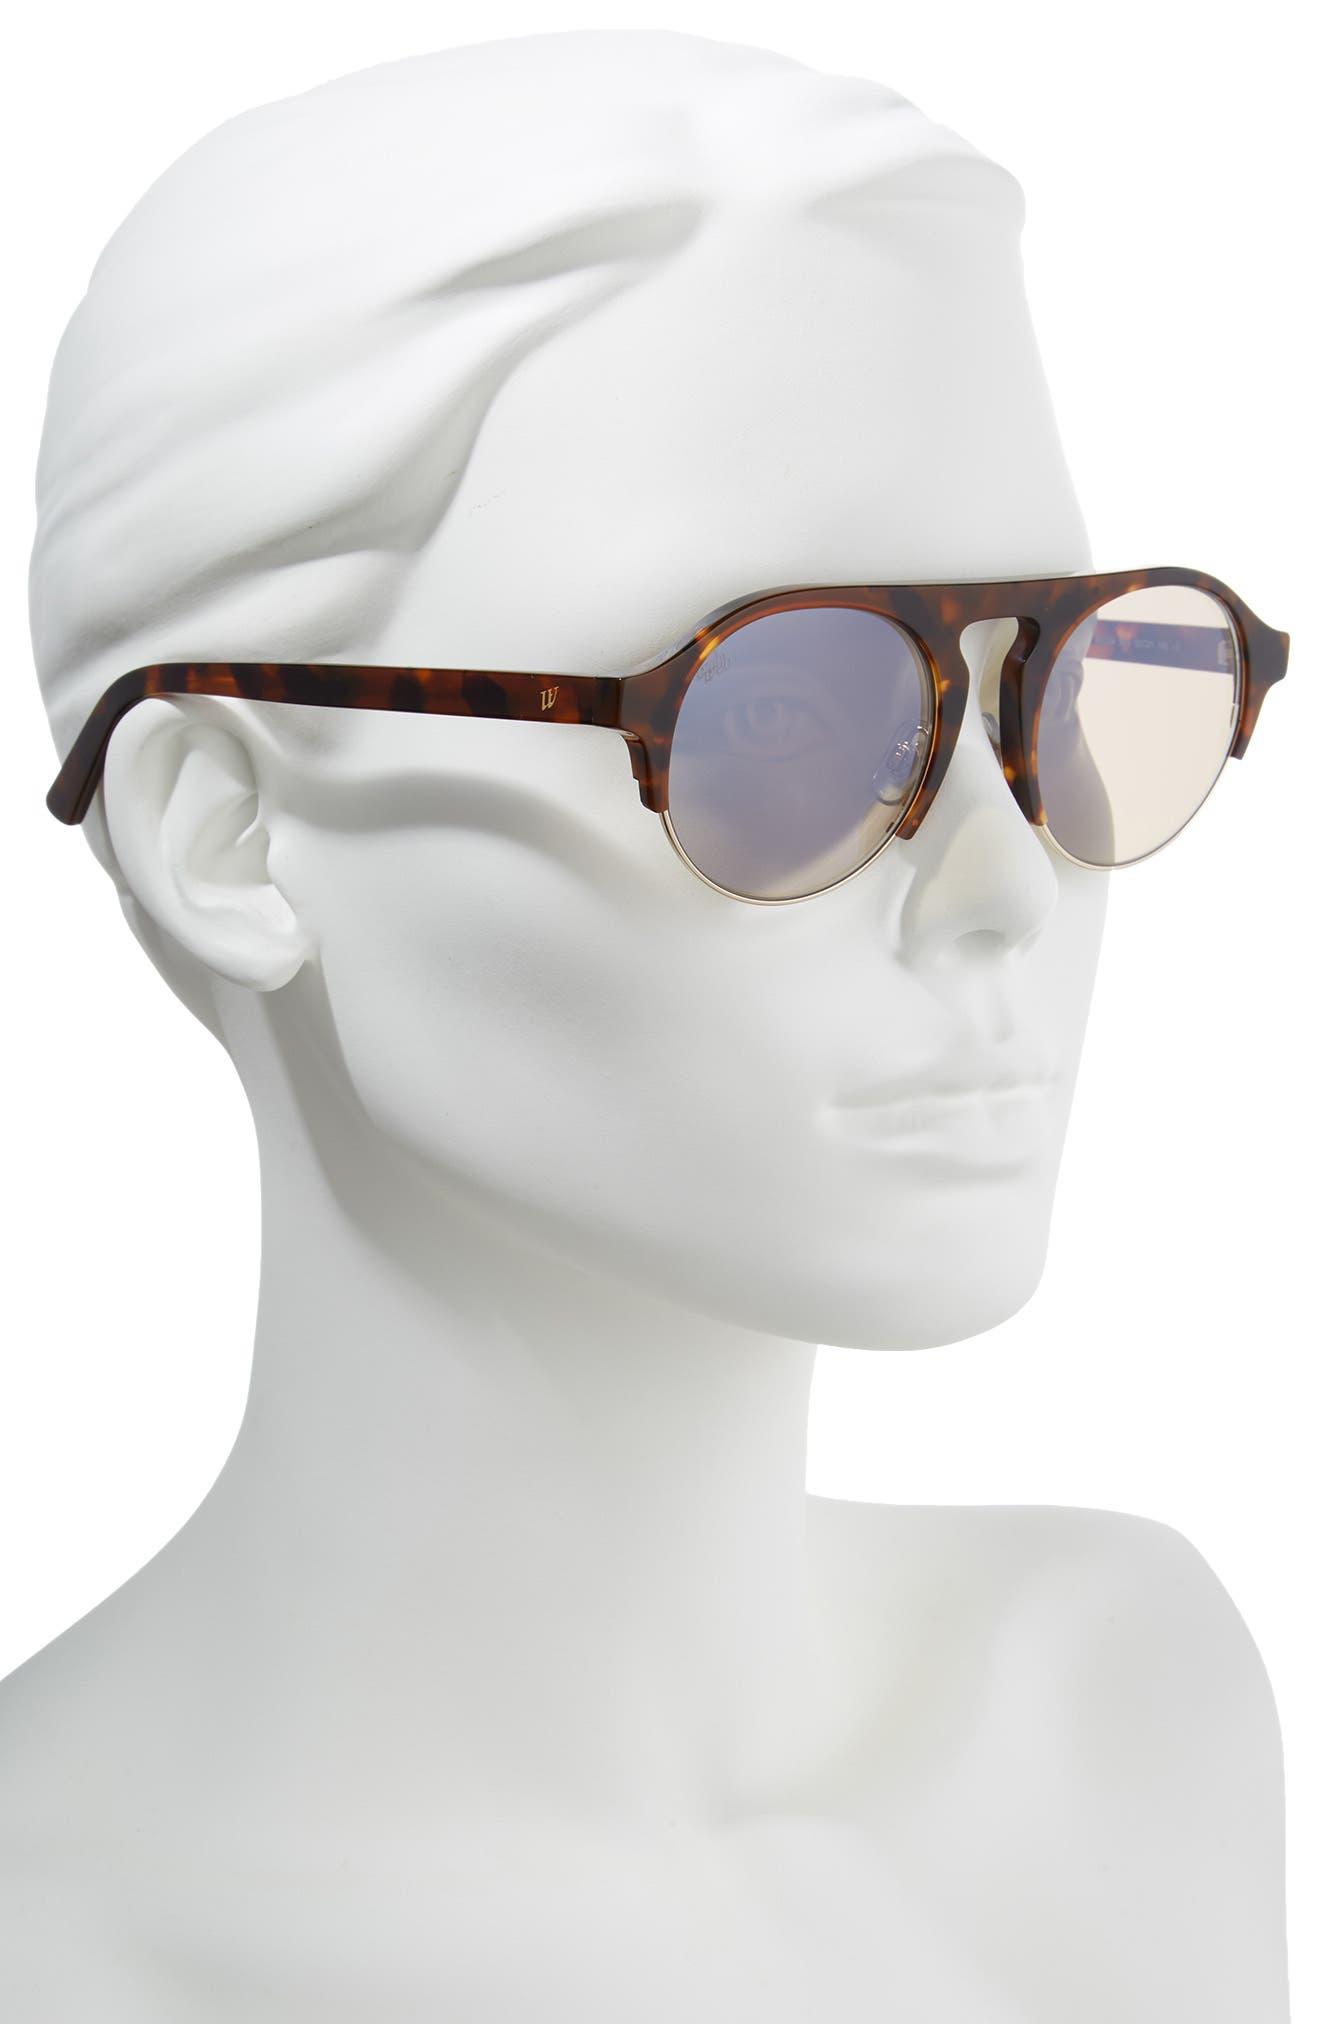 52mm Sunglasses,                             Alternate thumbnail 2, color,                             Dark Havana/ Brown Mirror